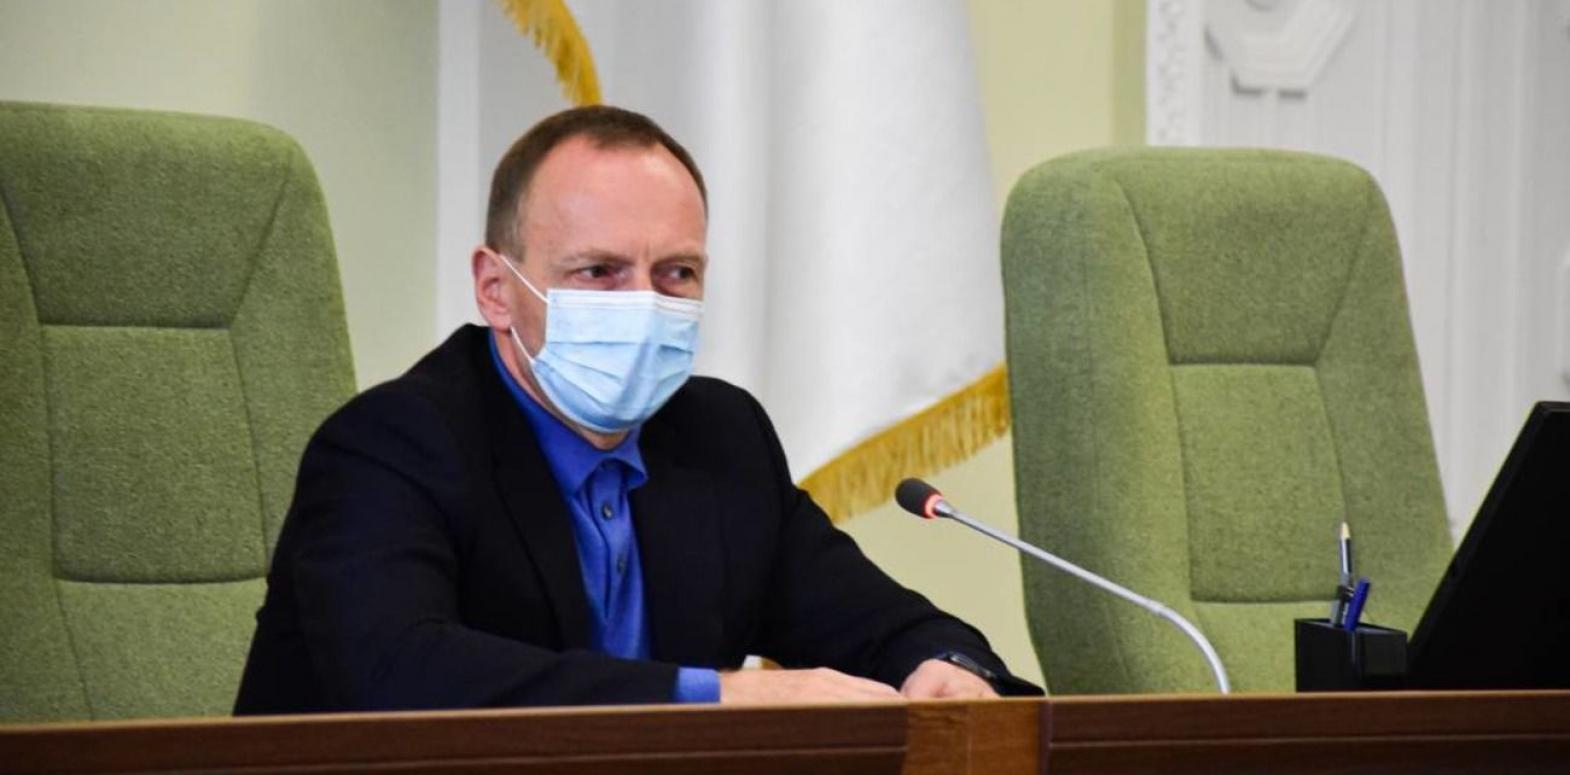 Мэр Чернигова направил обращение по тарифам на тепло министру развития общин